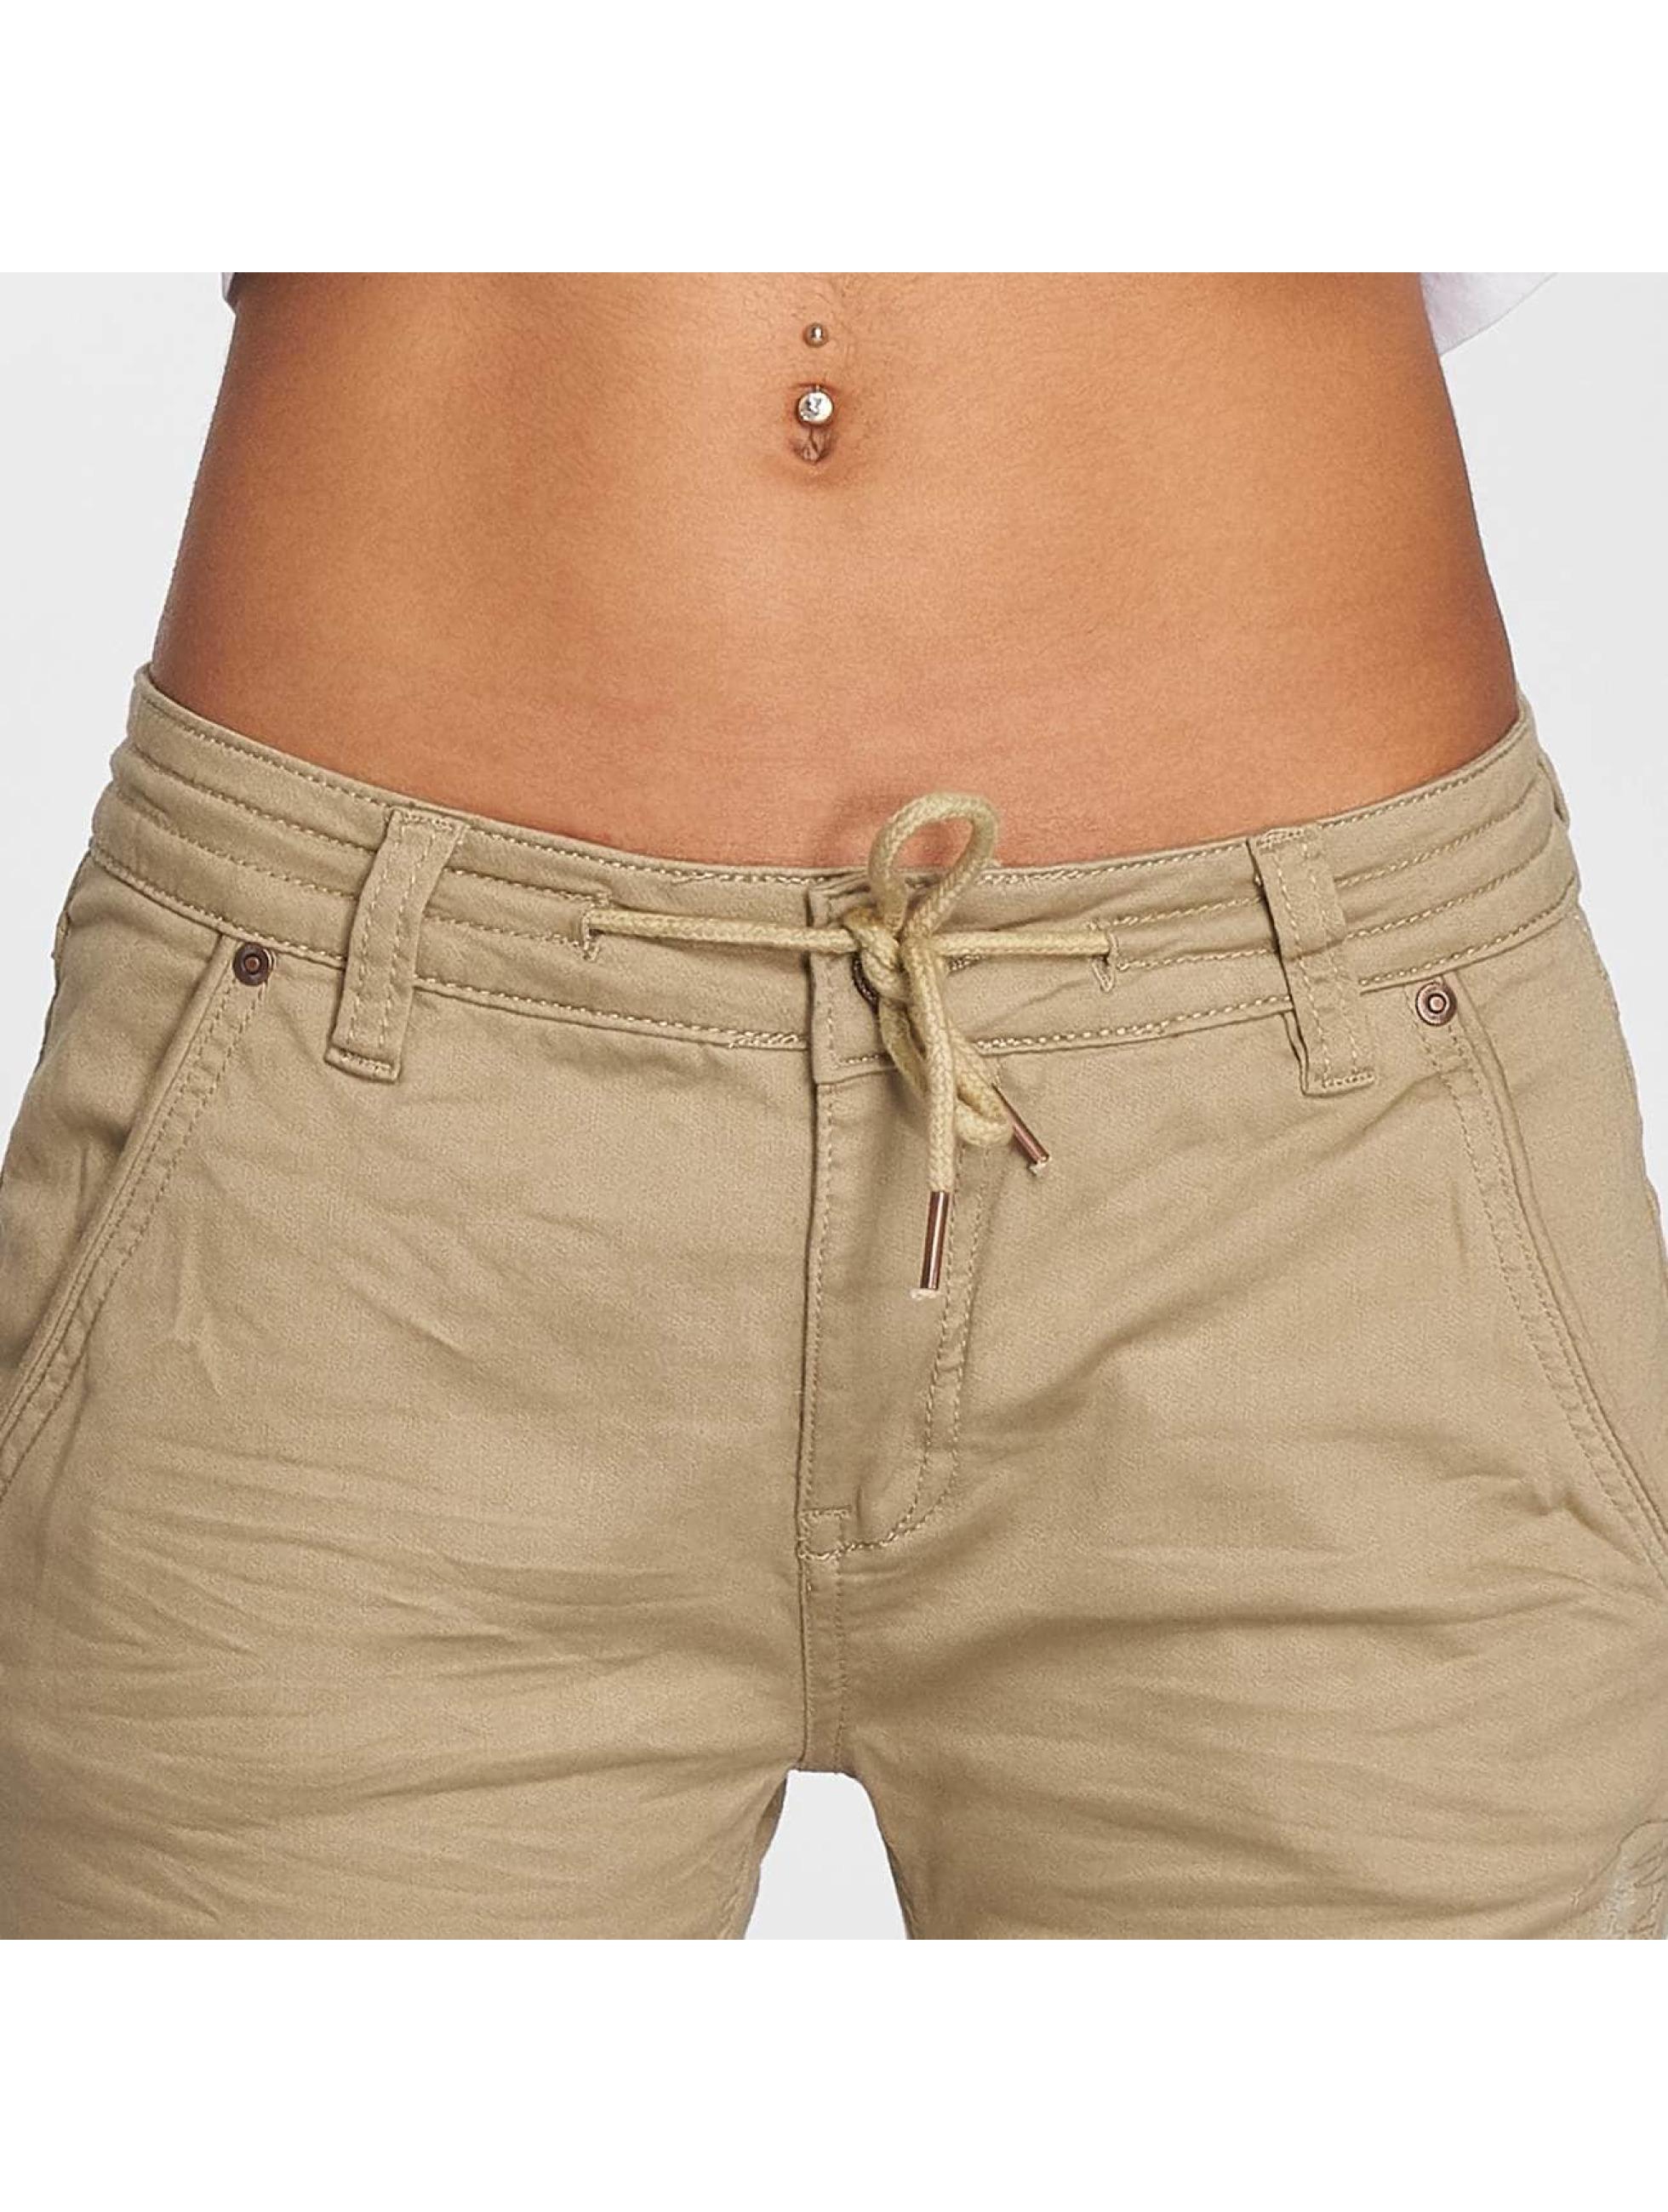 Fresh Made Spodnie do joggingu Capri Jogg bezowy